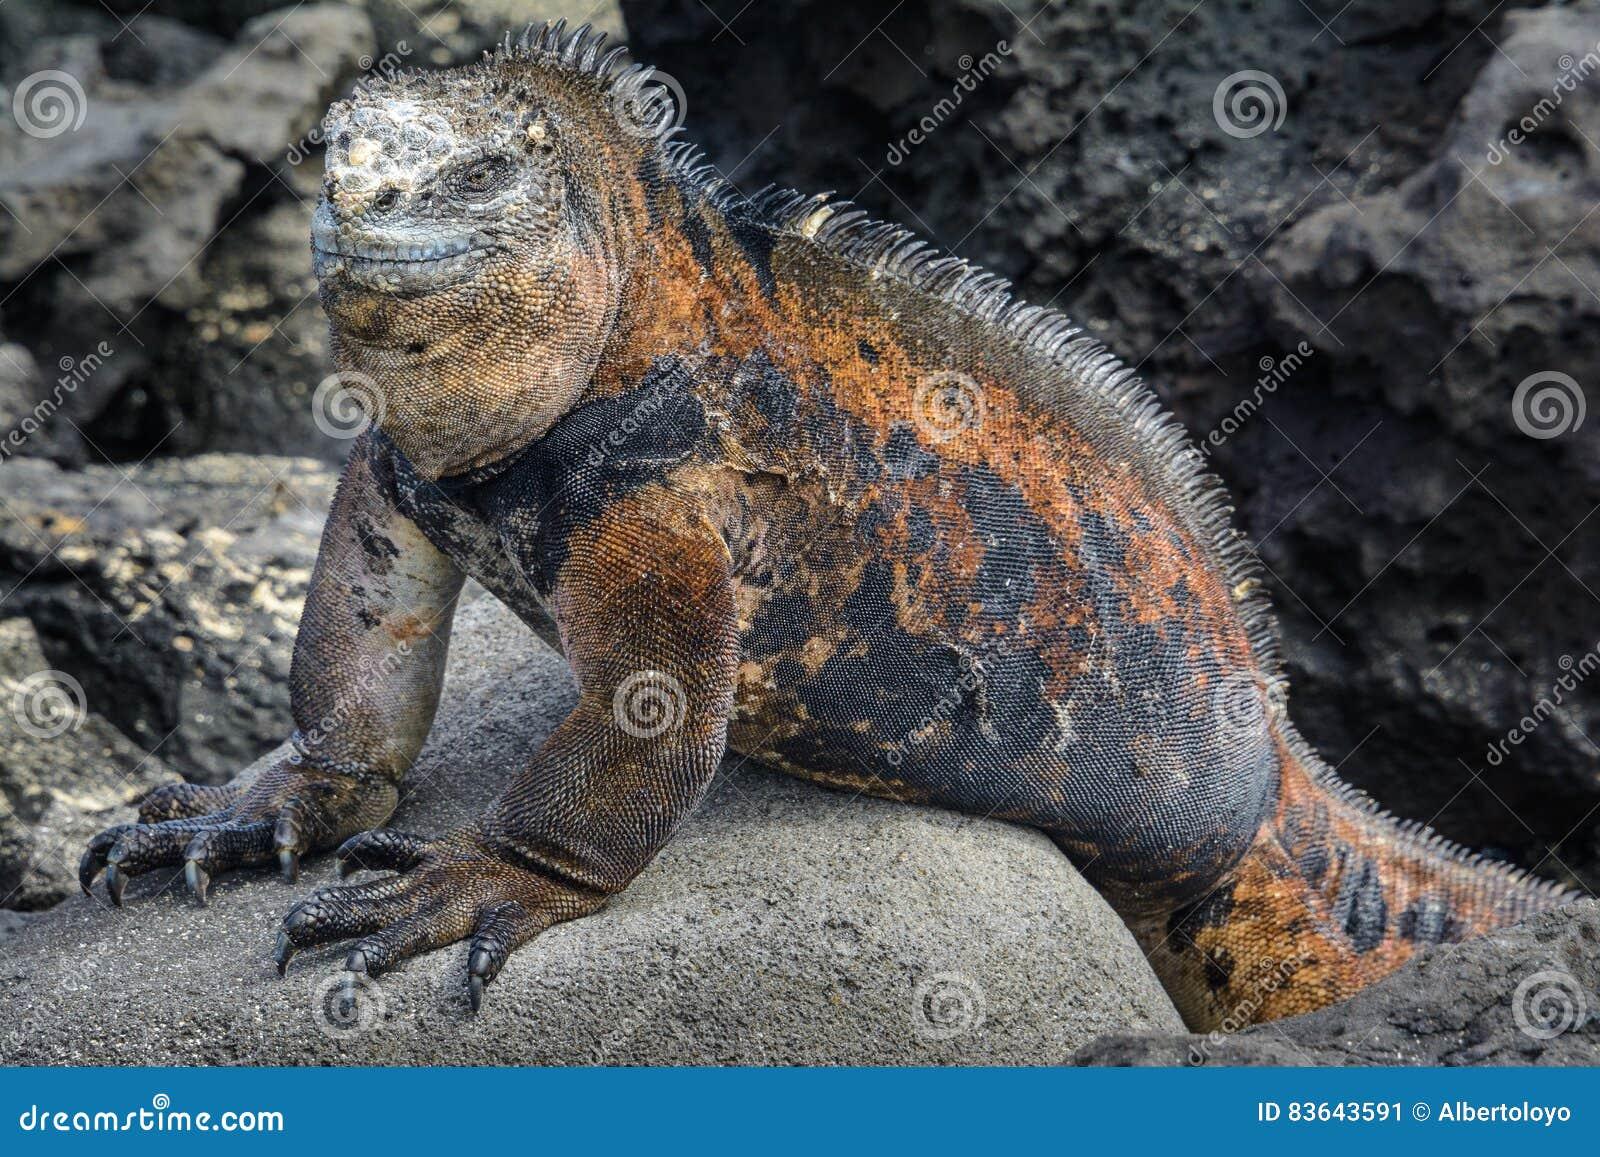 Galapagos Marine Iguana, San Cristobal Island, Ecuador Stock Image ...